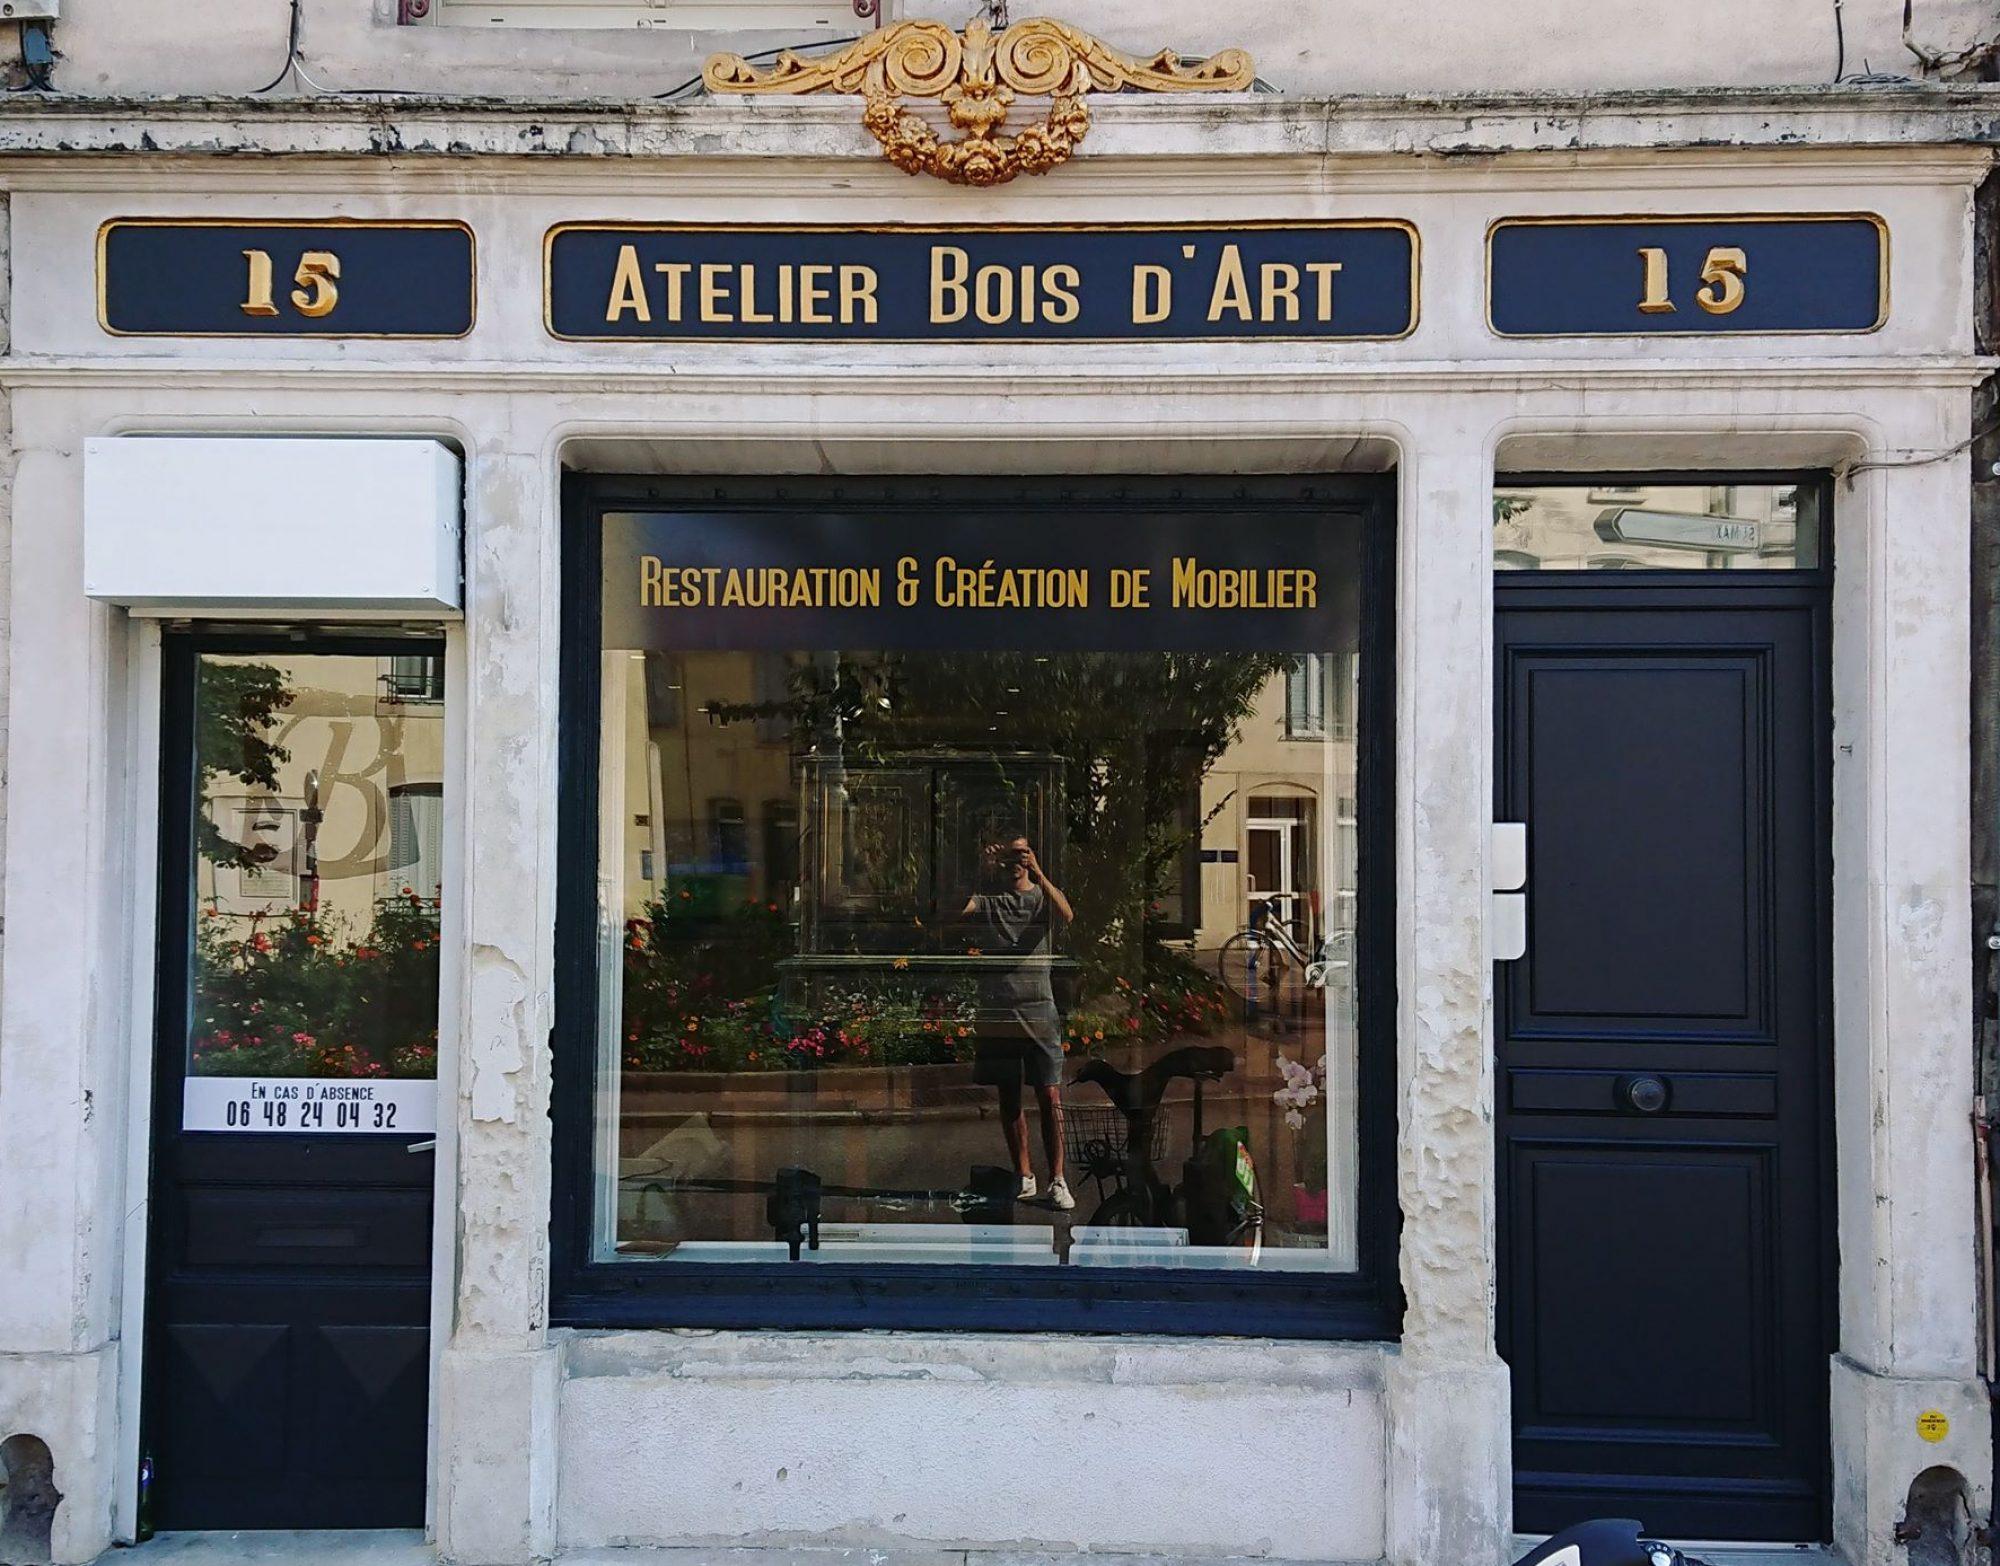 Atelier Bois D'Art